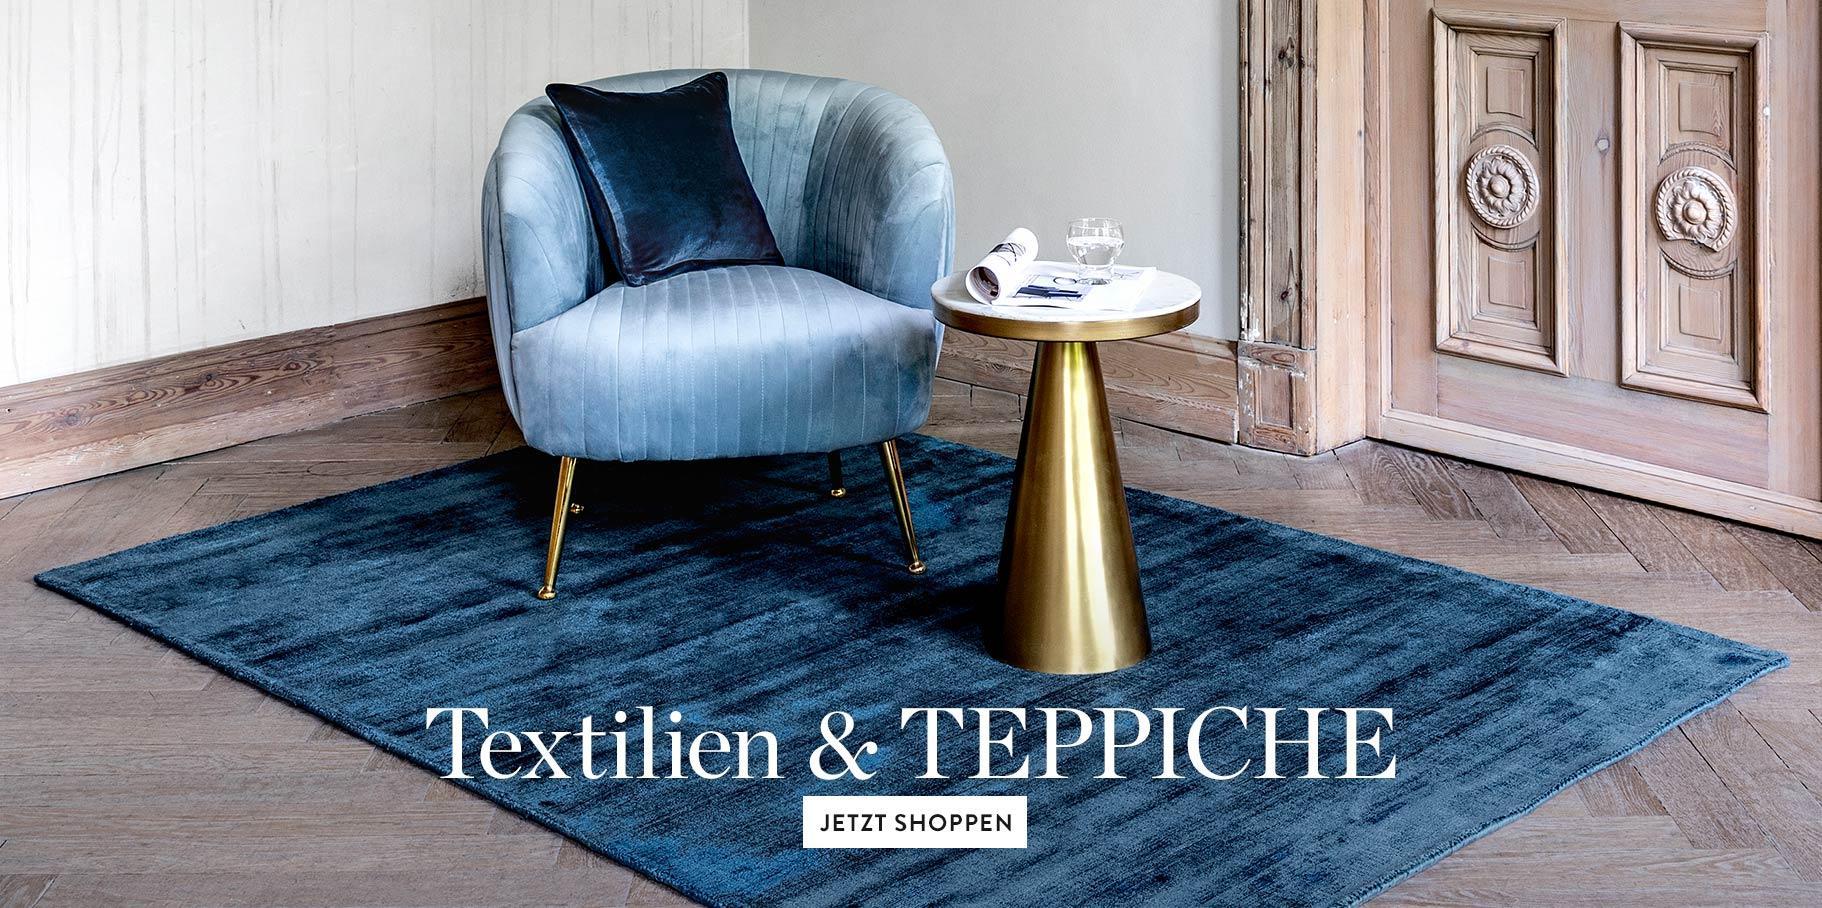 Home-Textilien & Teppiche